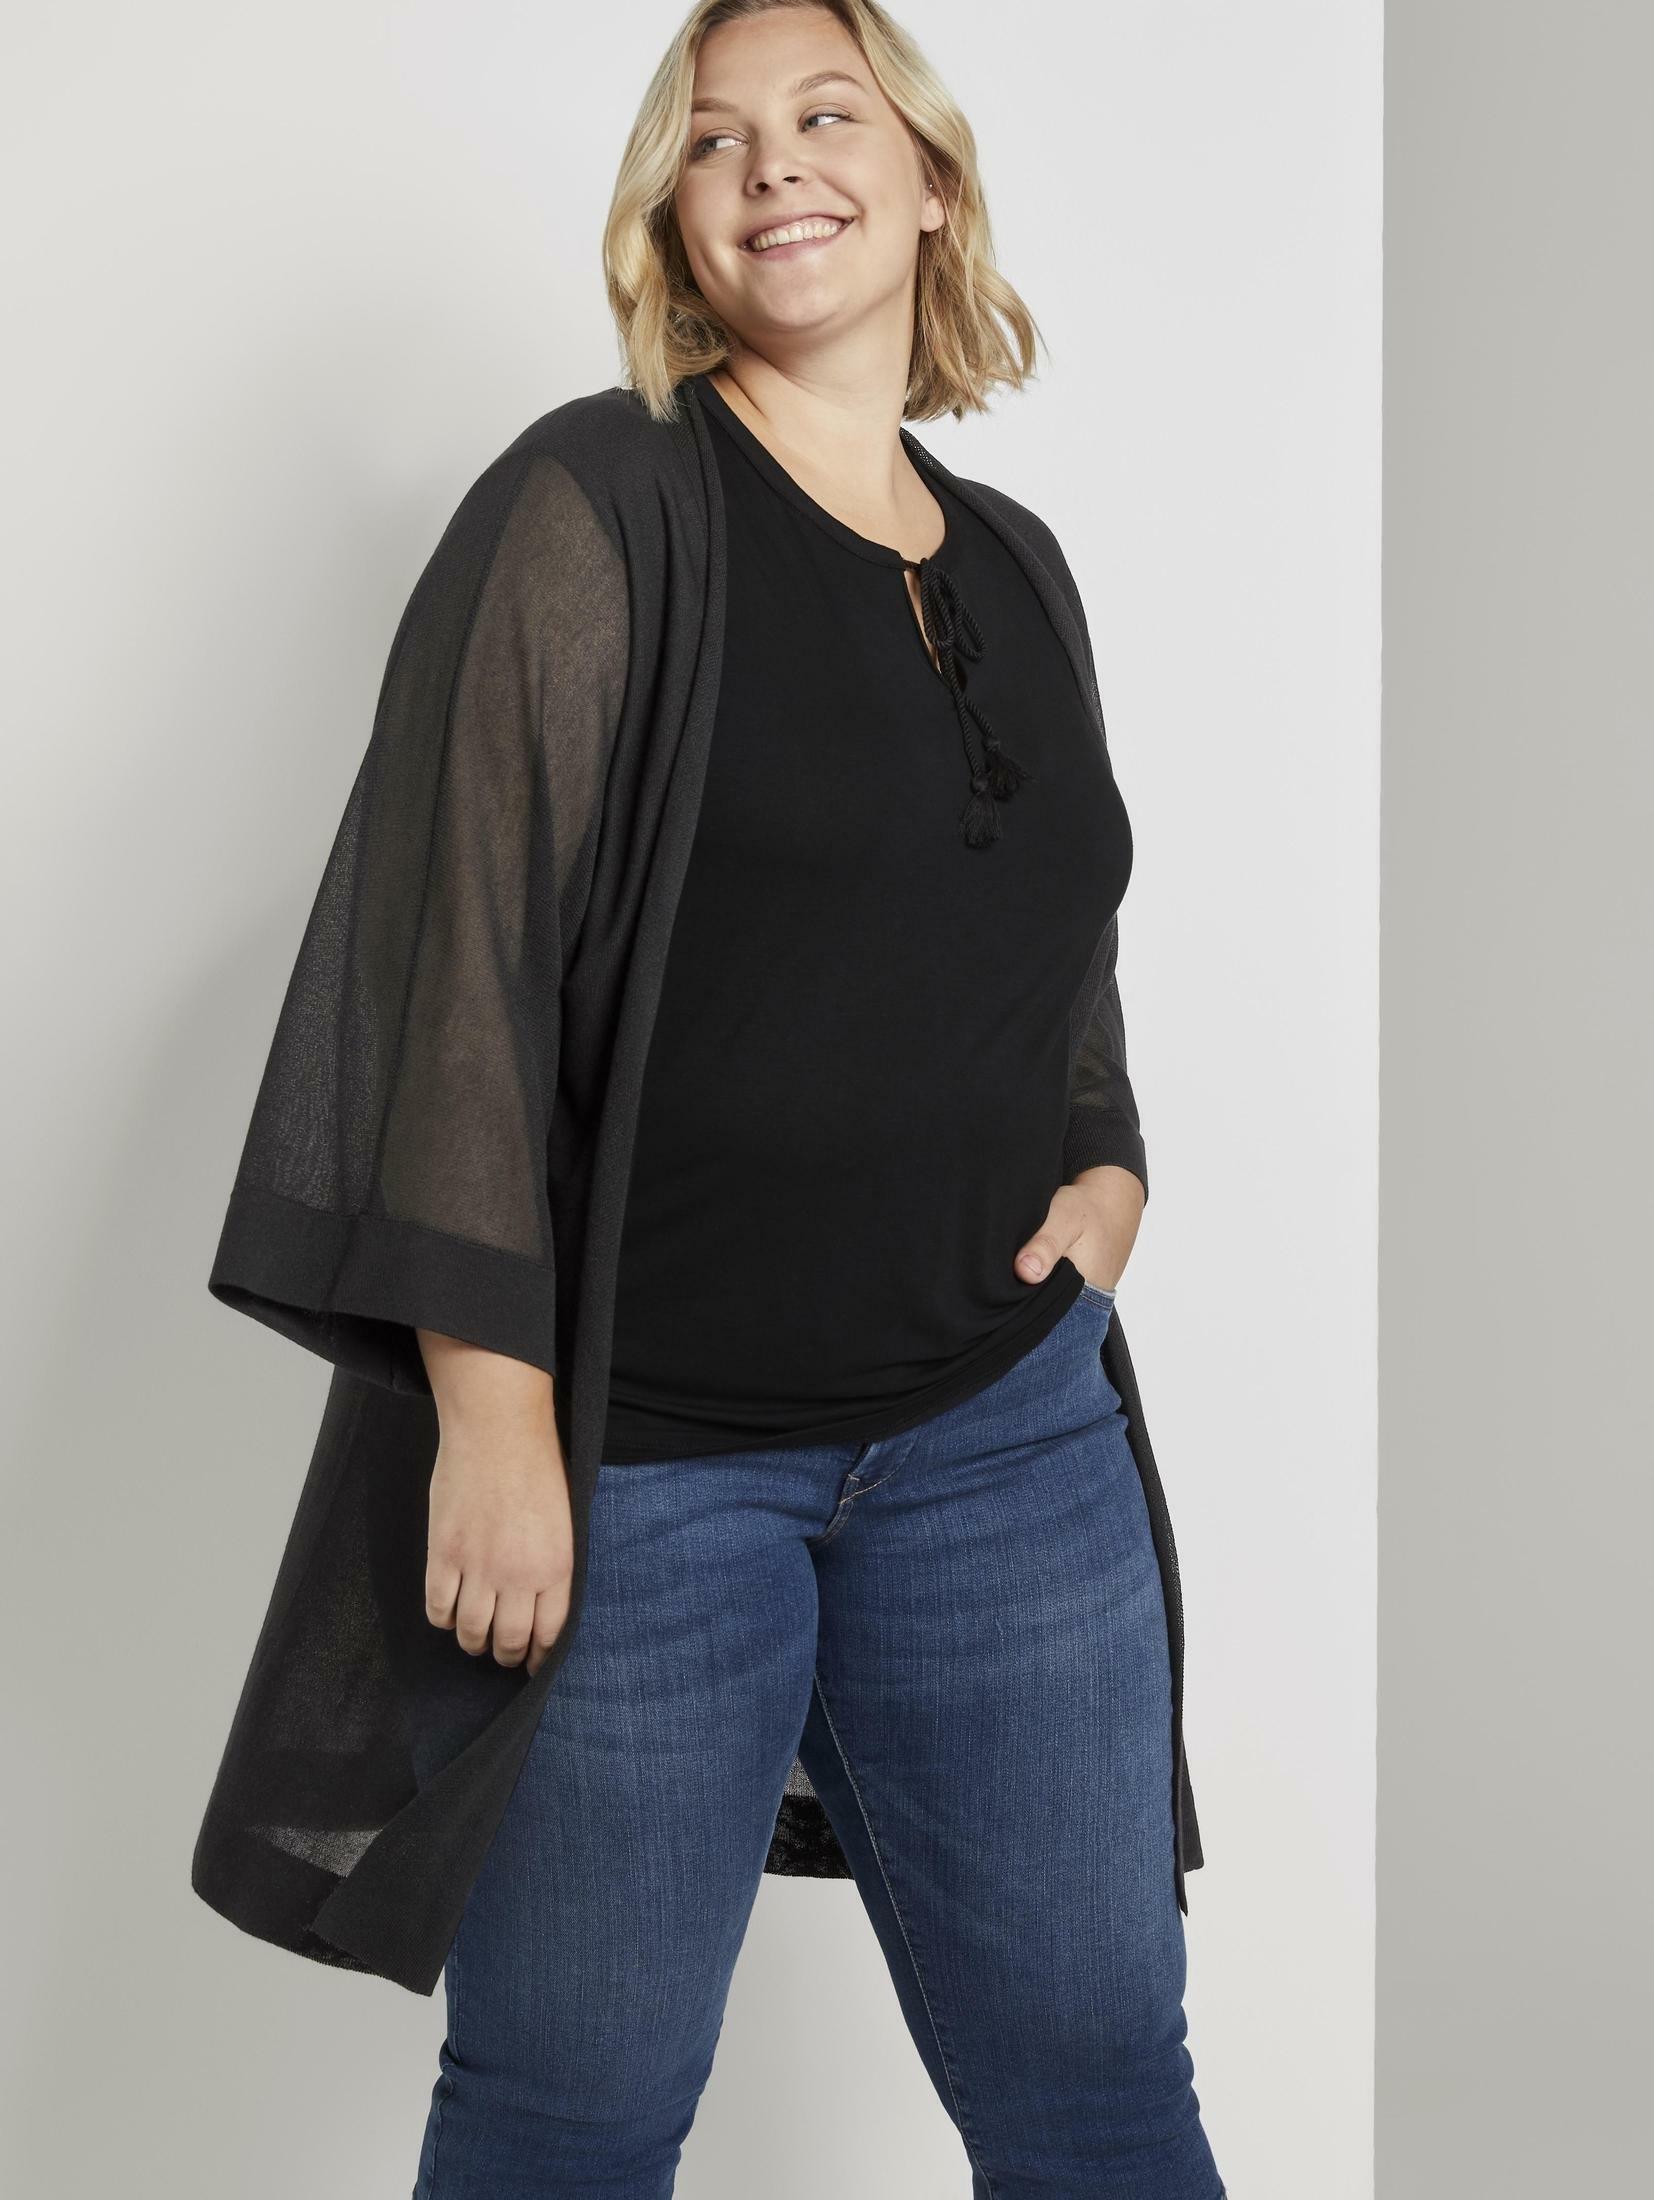 TOM TAILOR MY TRUE ME vest »Lockerer Kimono-Cardigan« bij OTTO online kopen